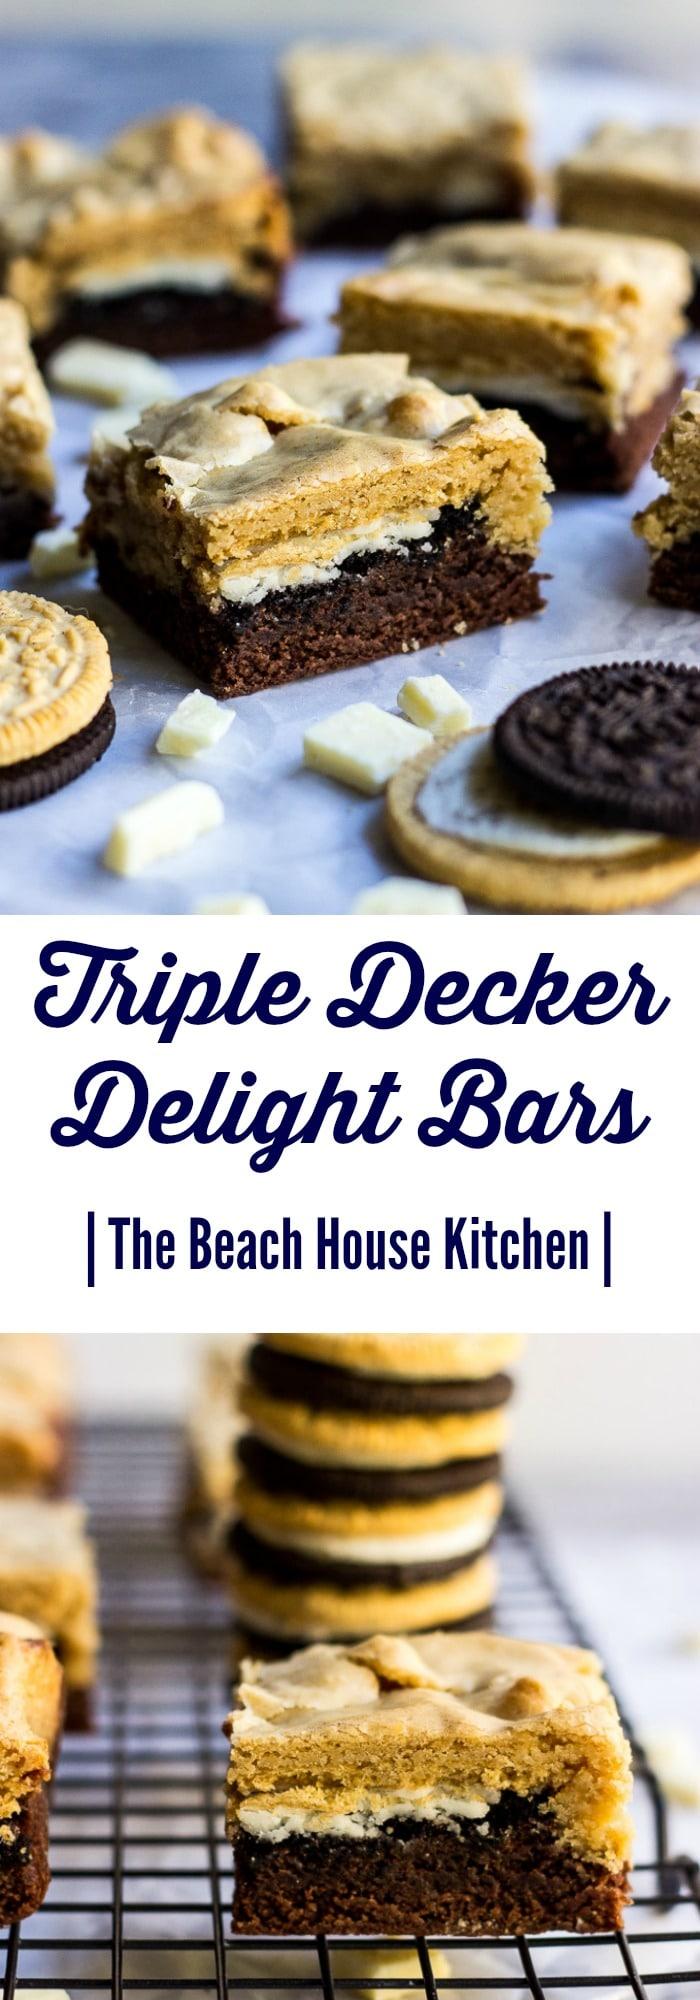 Triple Decker Delight Bars